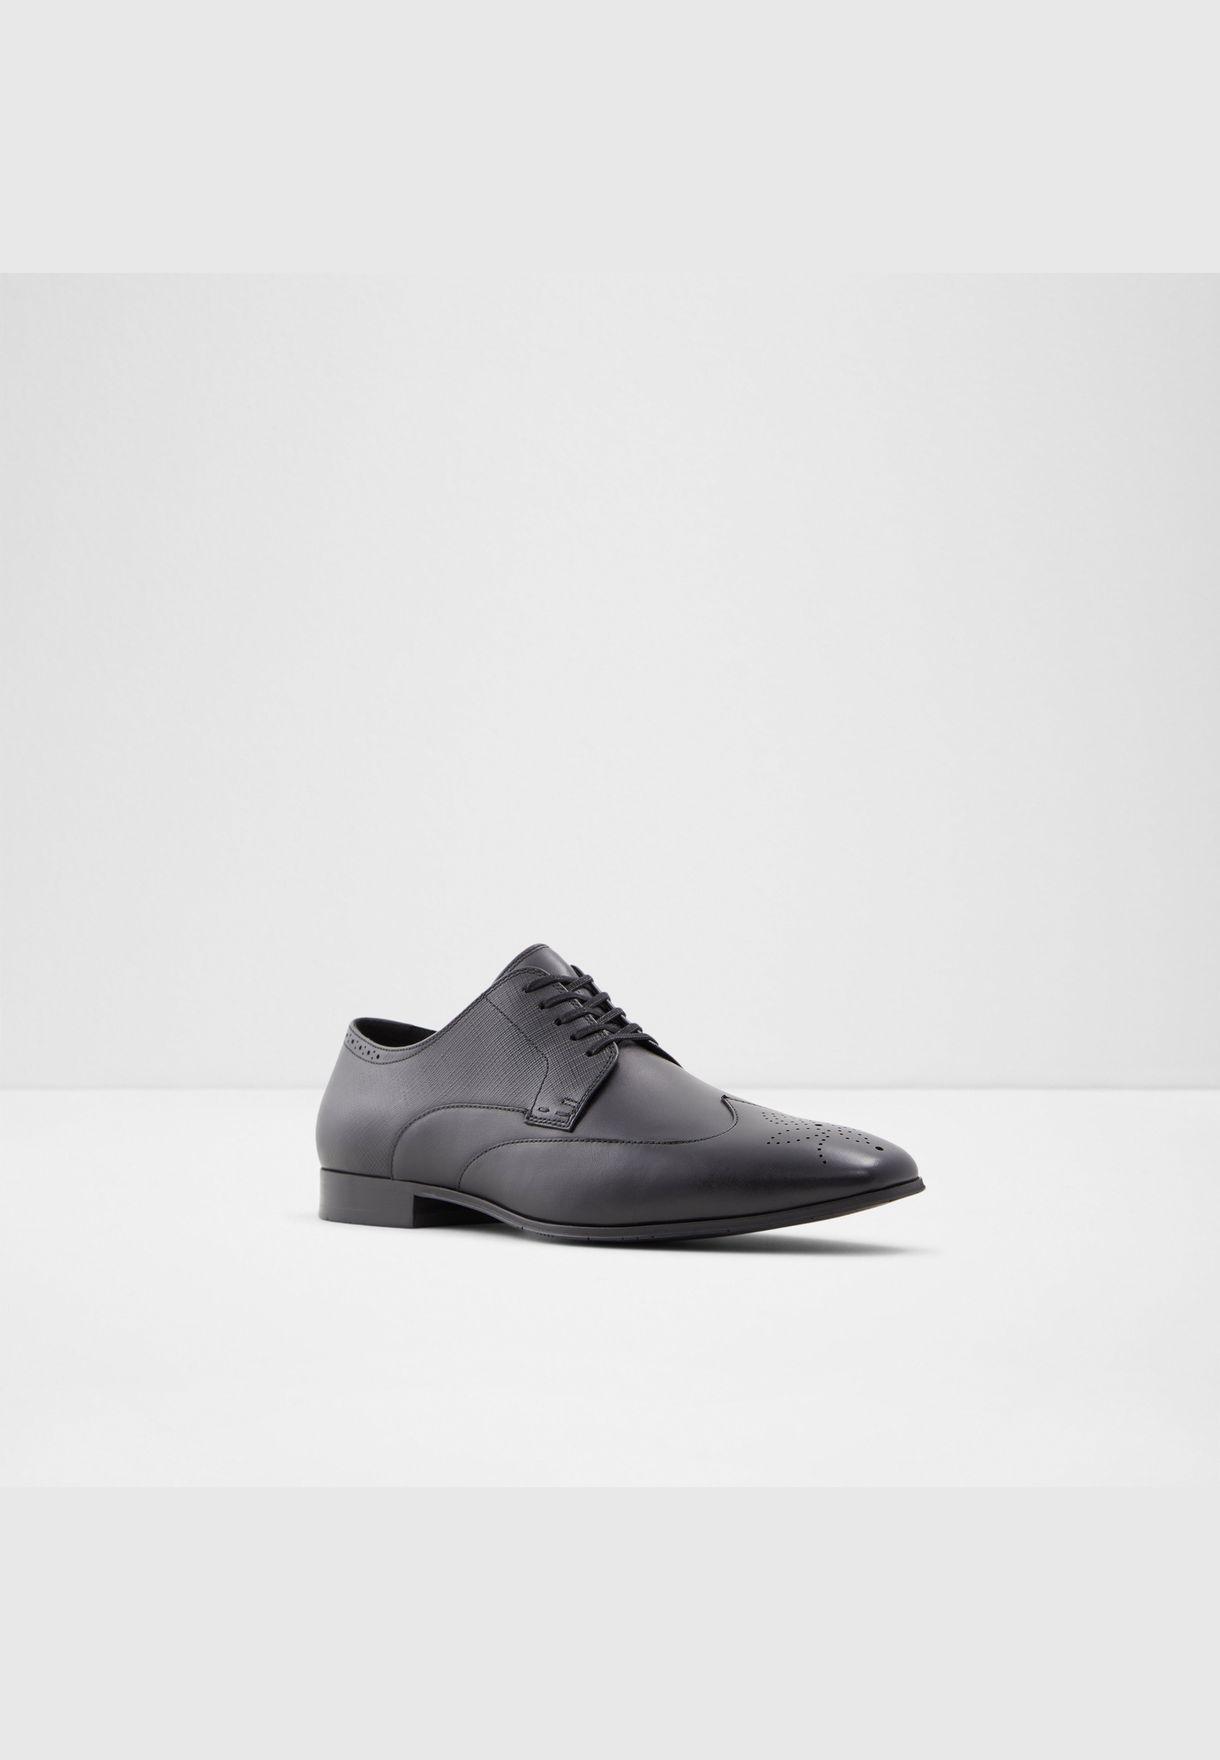 Genuine Leather Shoes Flat Heel